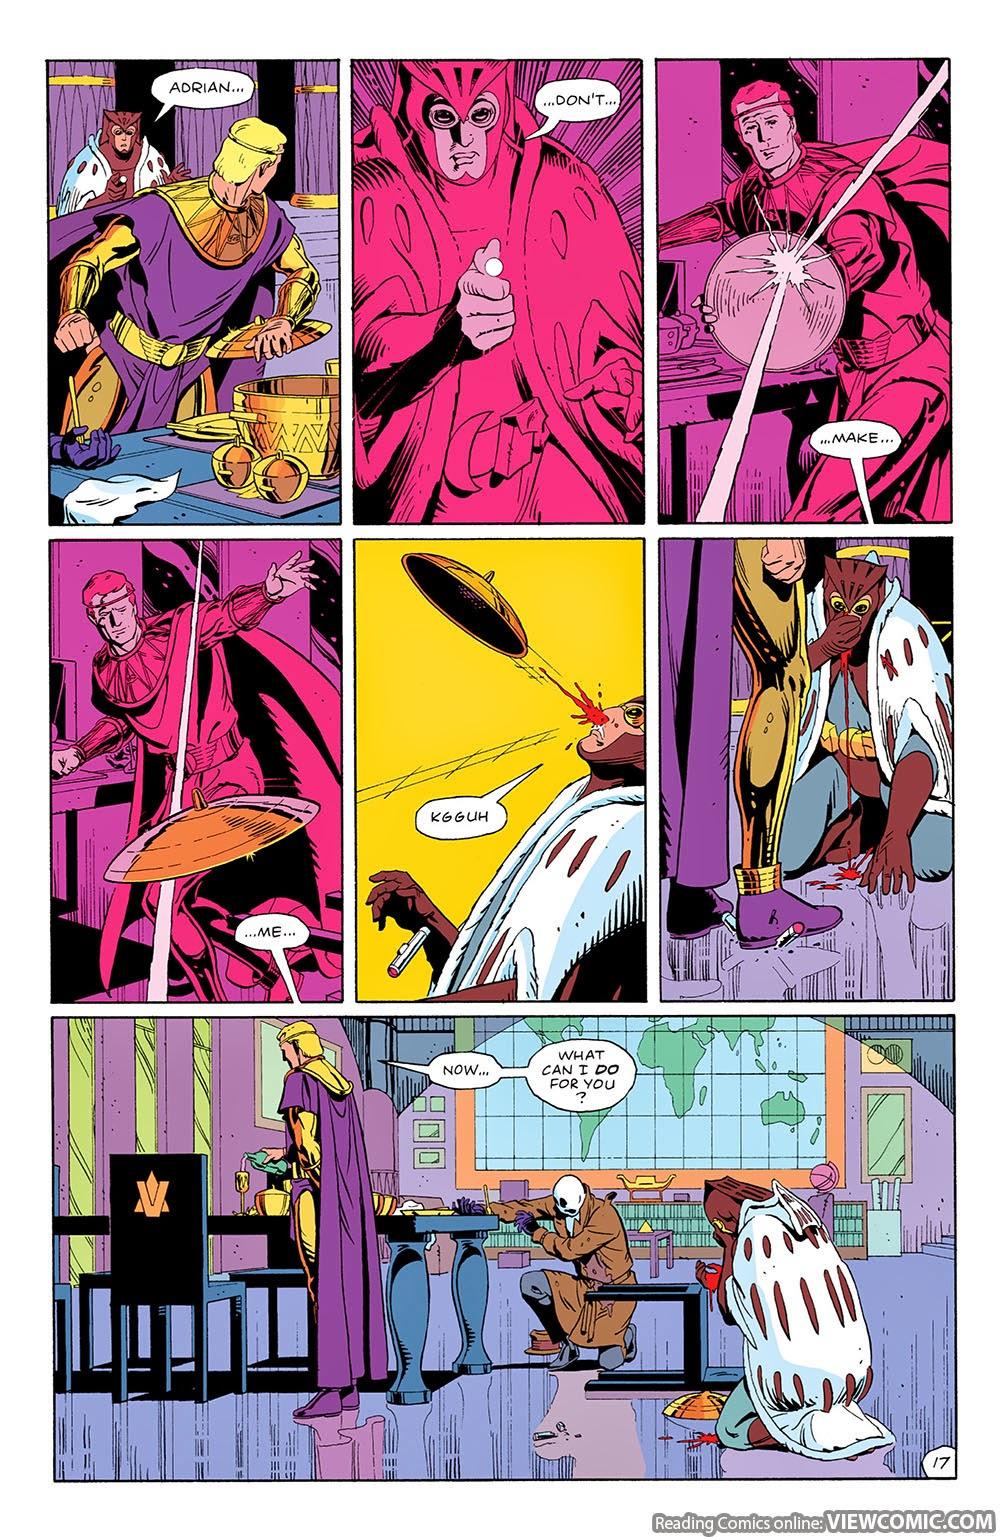 watchmen 11 viewcomic reading comics online for